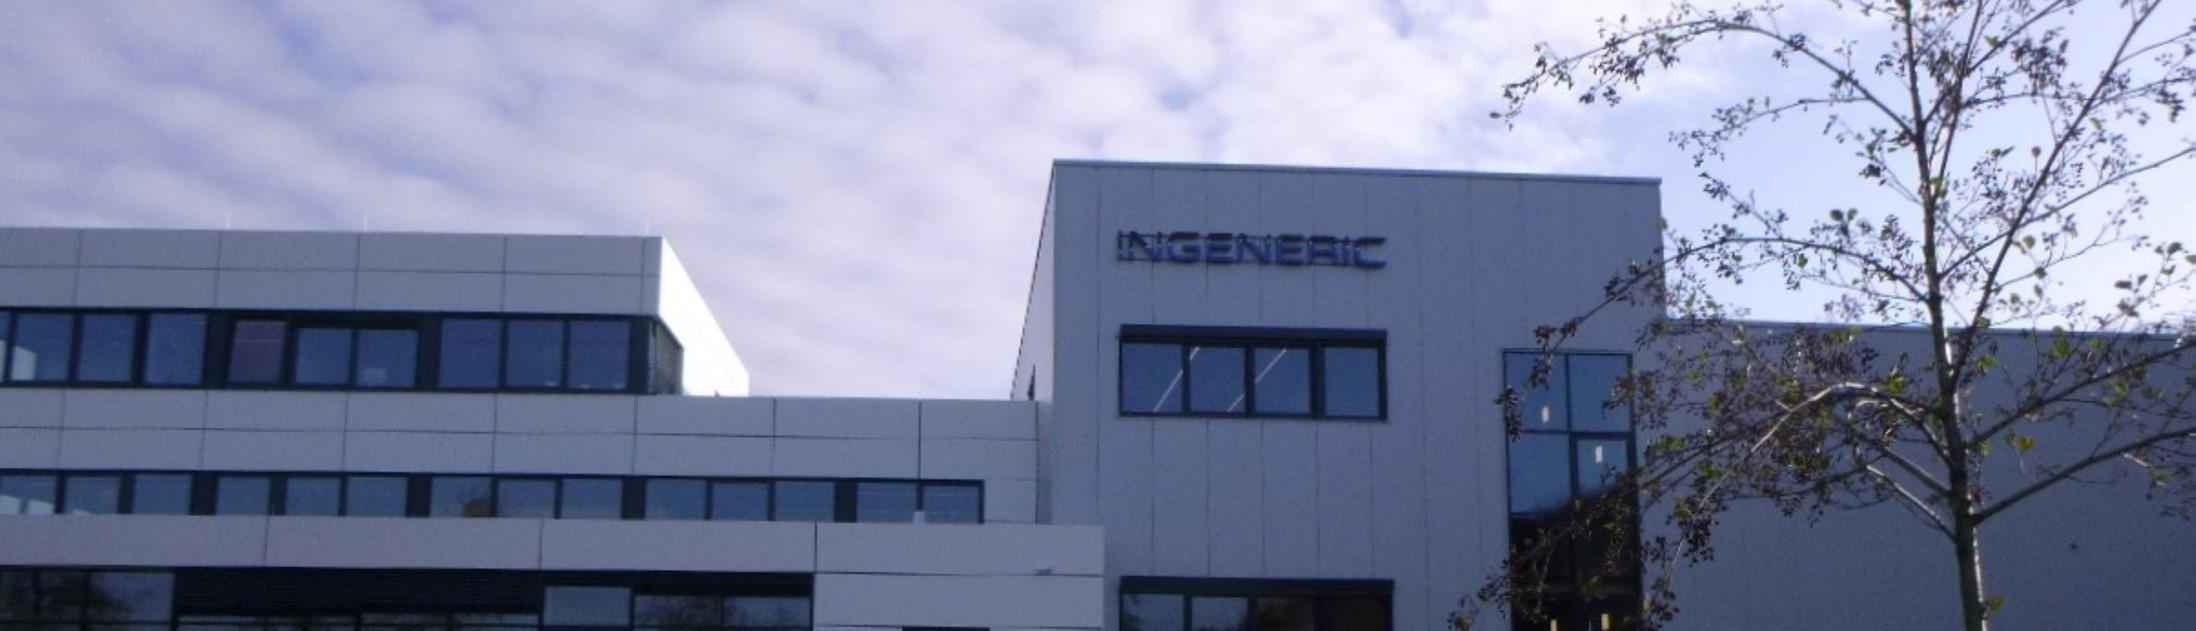 Ingeneric Hauptsitz